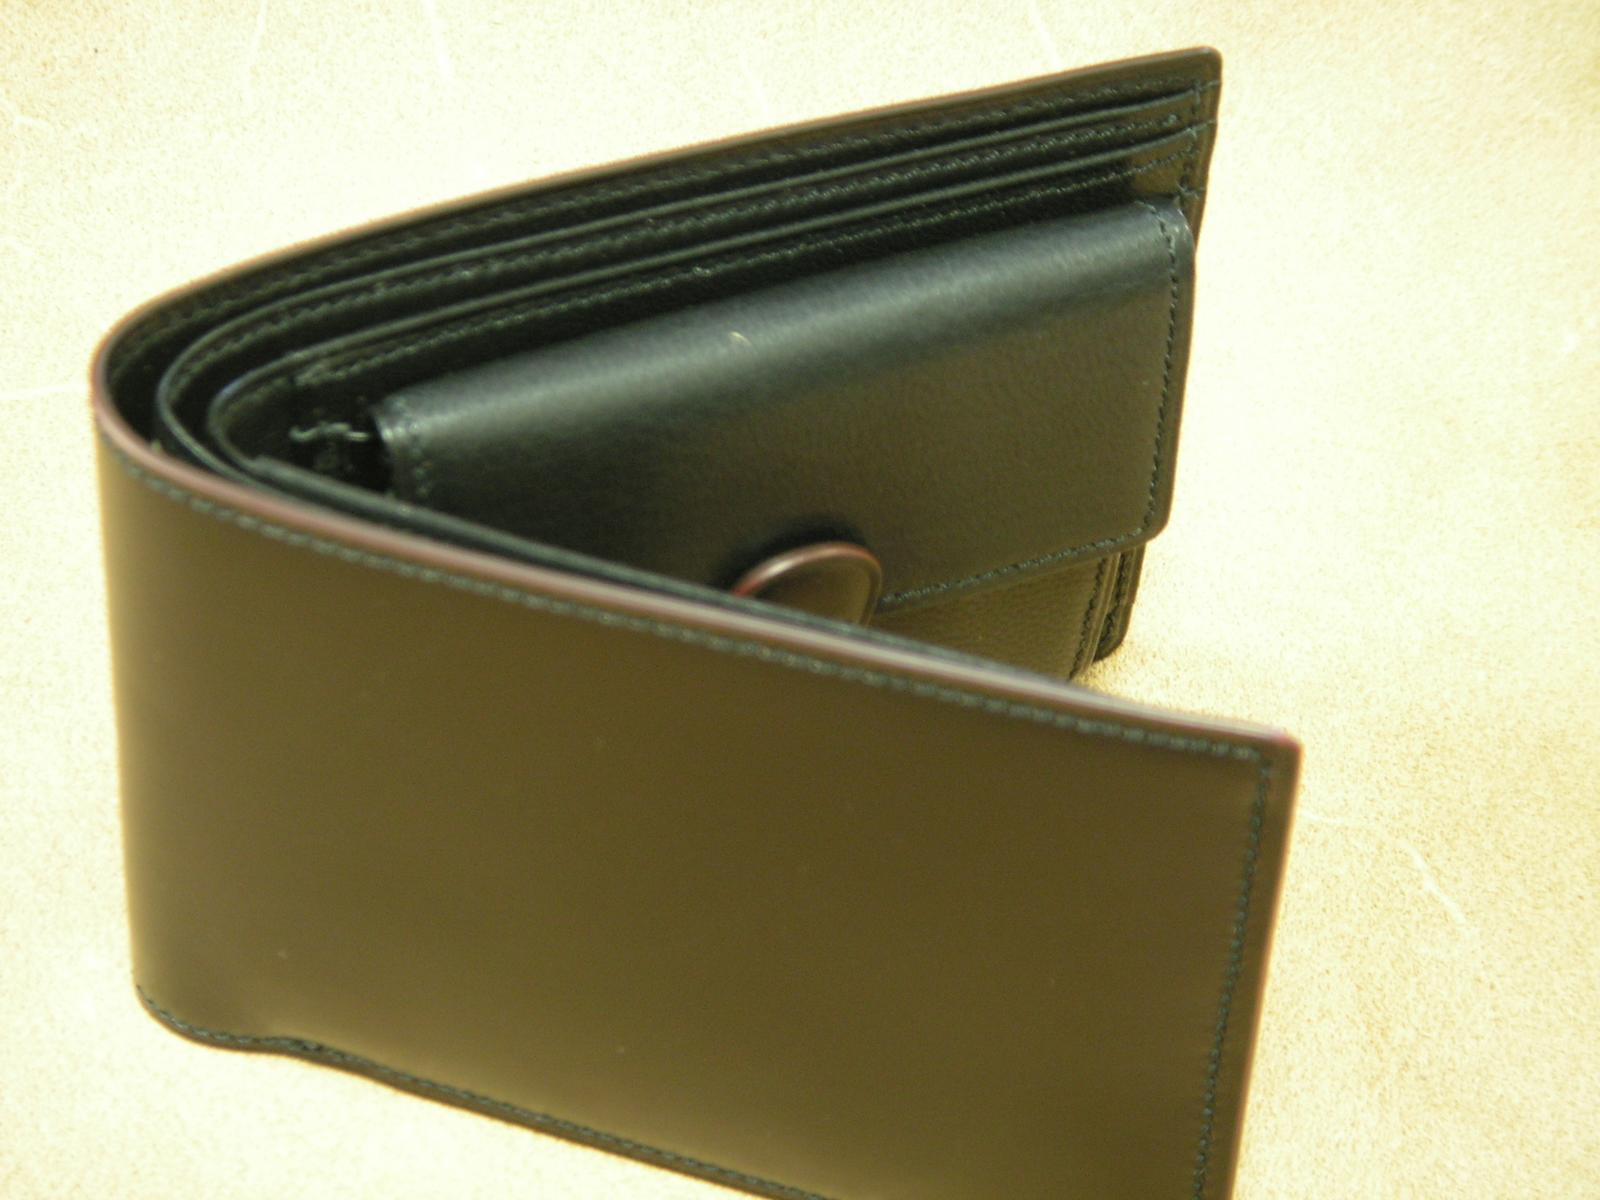 Vincis Gate天狗付二つ折れ財布(コ−ドバン:ブラック)